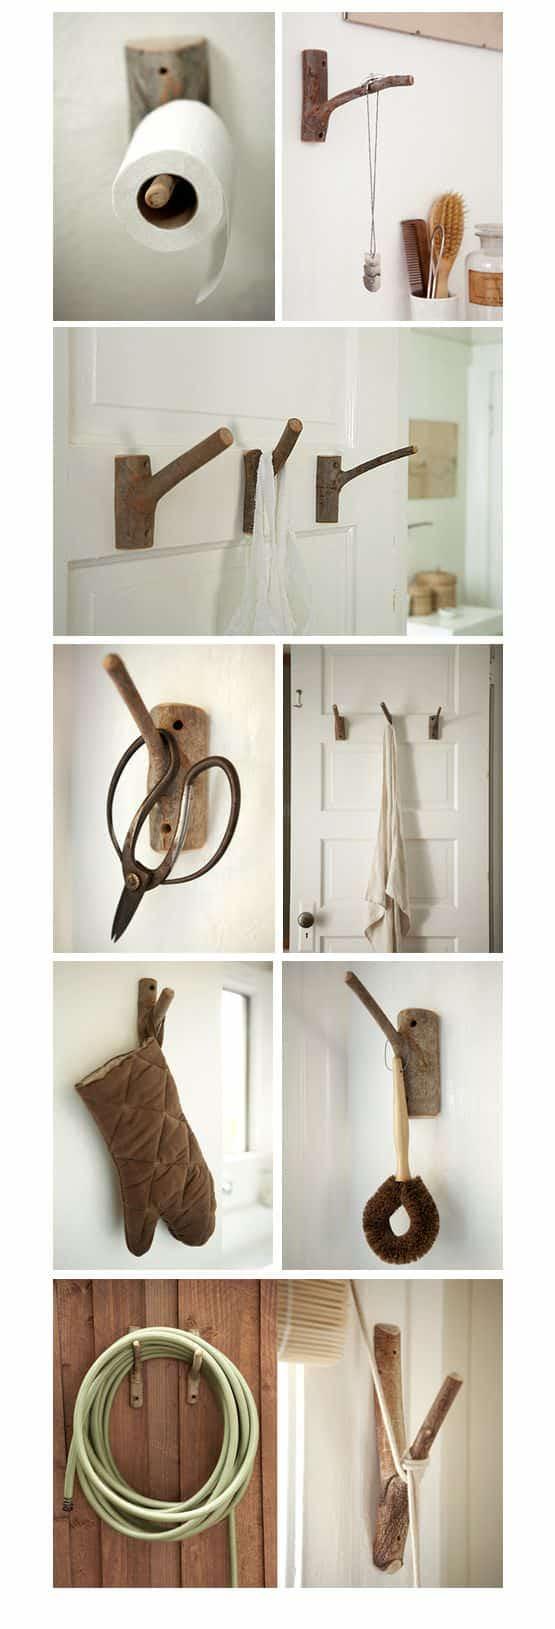 Diy: Branch Hooks Do-It-Yourself Ideas Wood & Organic